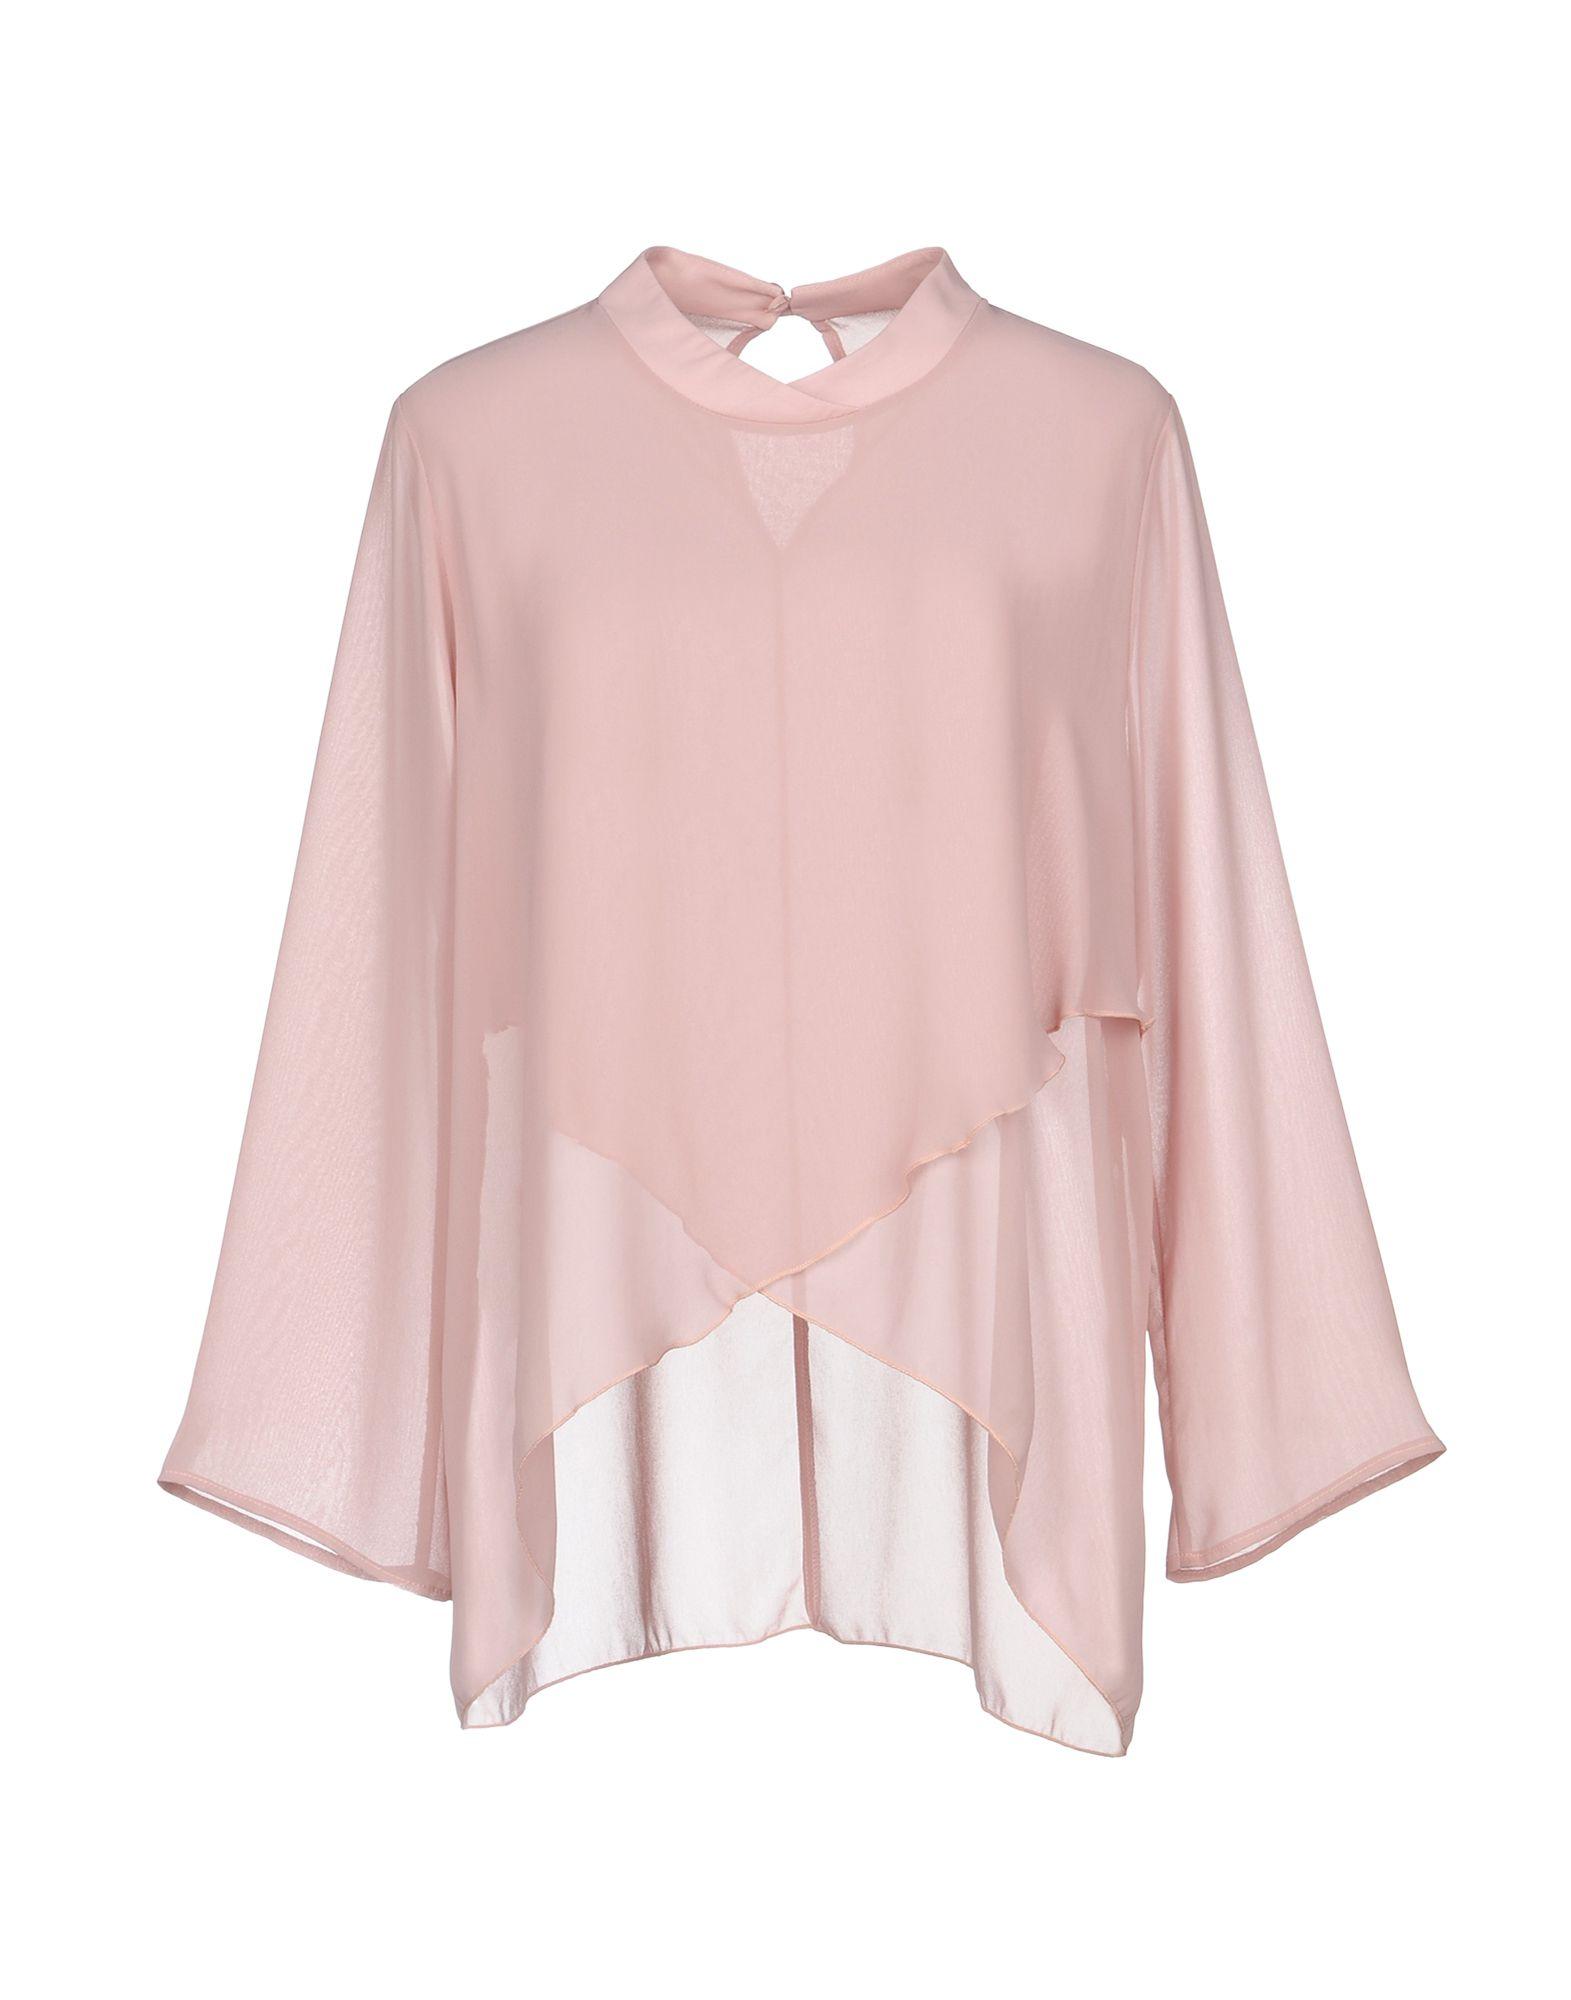 RUETRENTATRE Блузка ruetrentatre пиджак